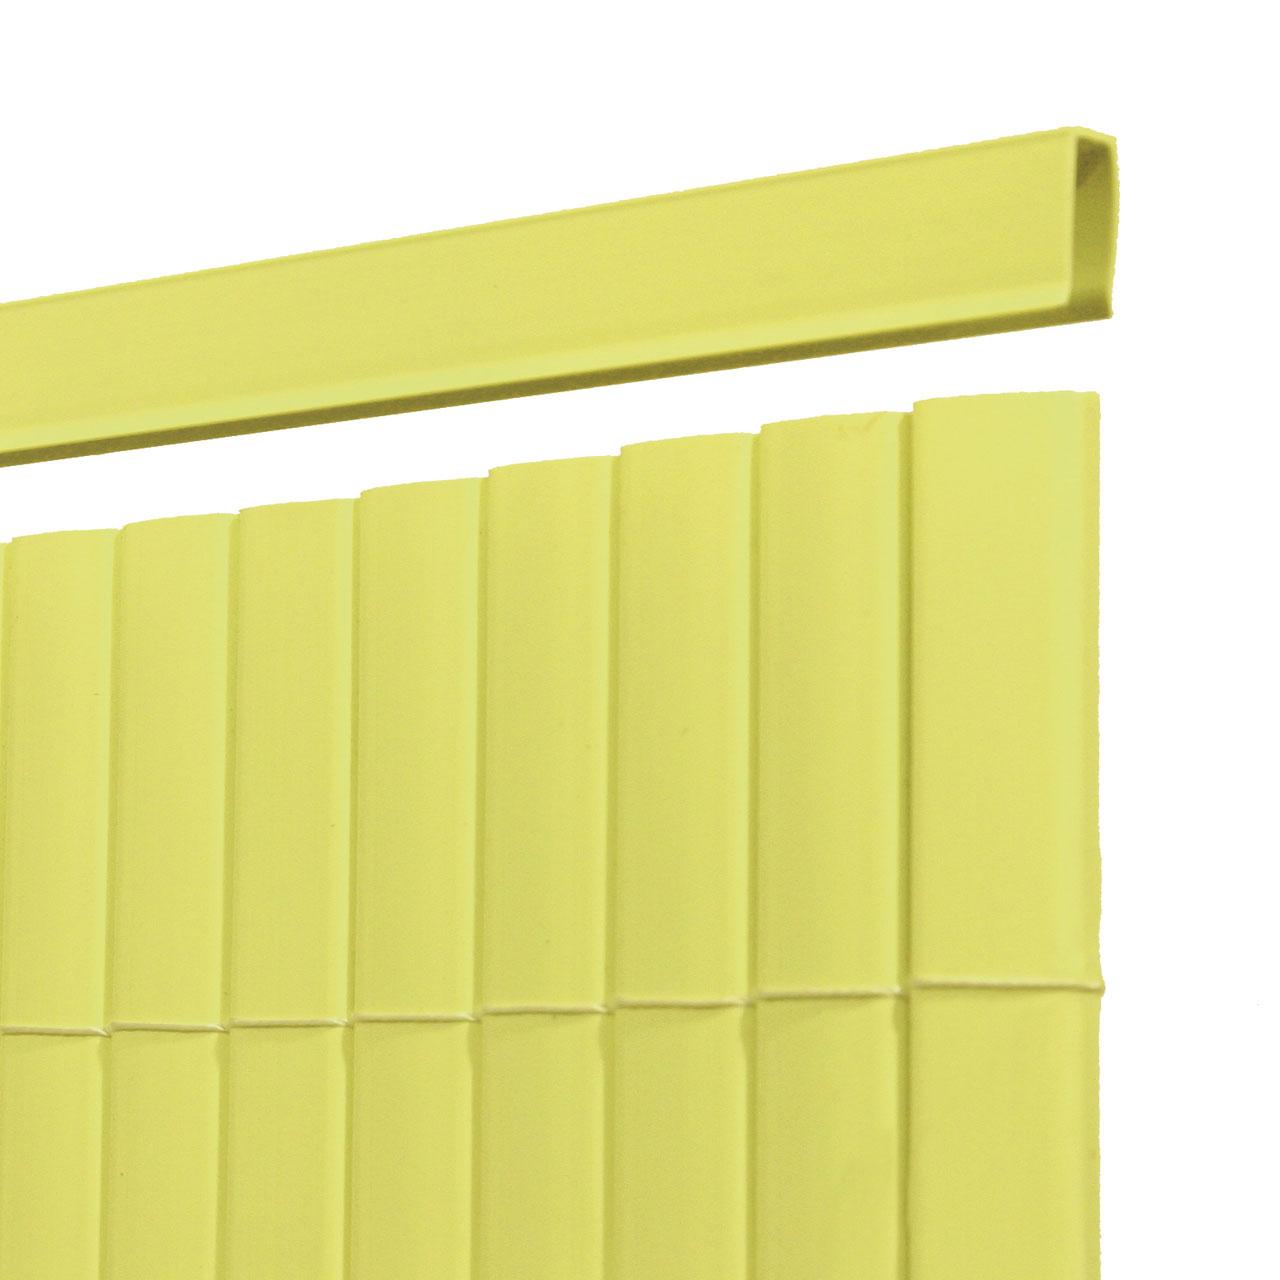 Sichtschutzfolie obi kollektion ideen garten design als for Raumgestaltung inspiration